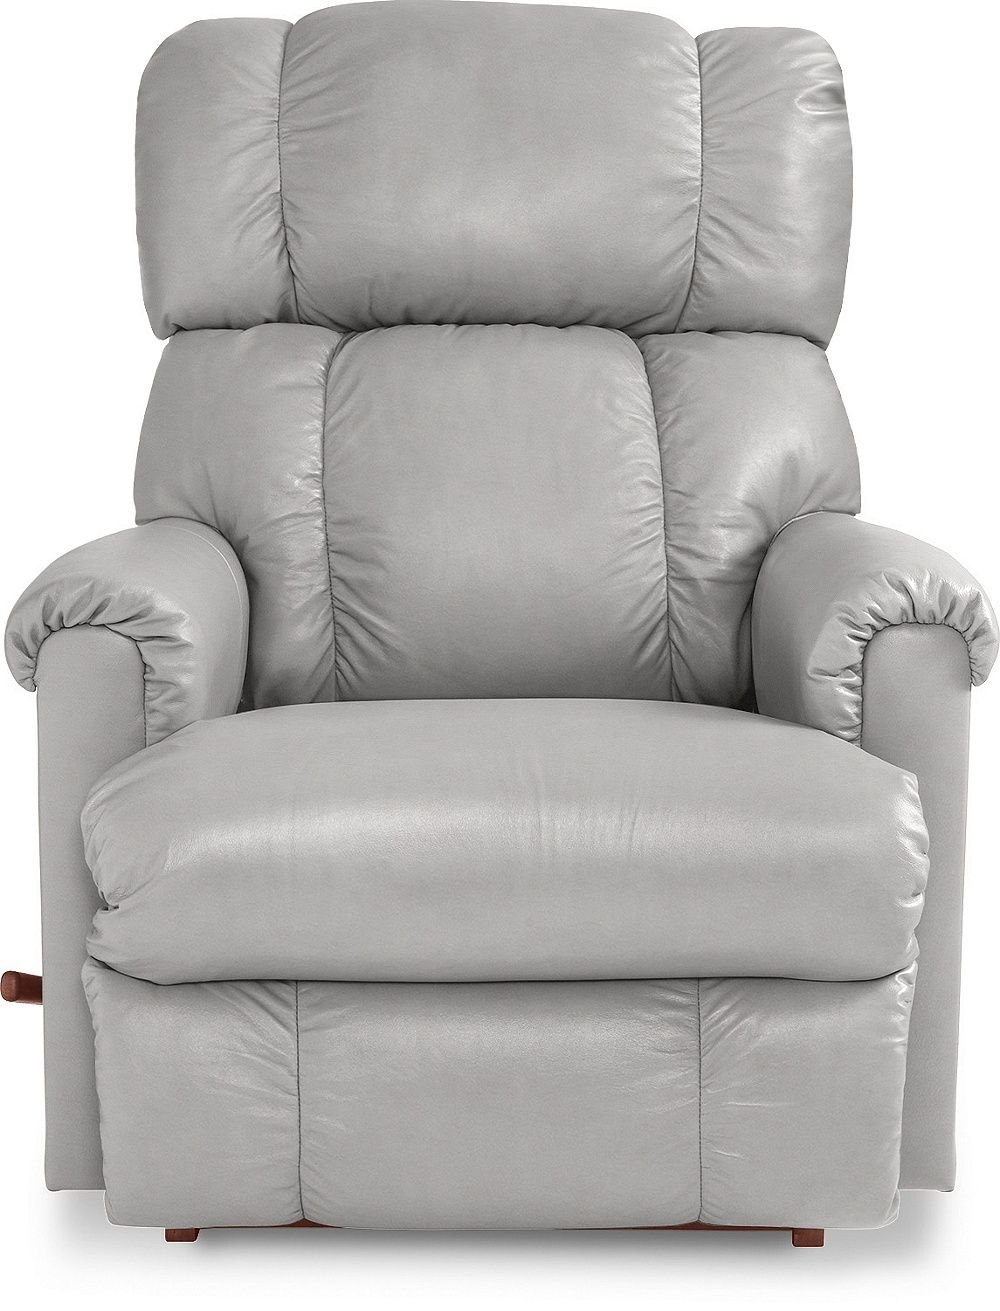 Pinnacle Wall Recliner Swivel Rocker Recliner Chair Swivel Recliner Recliner Chair